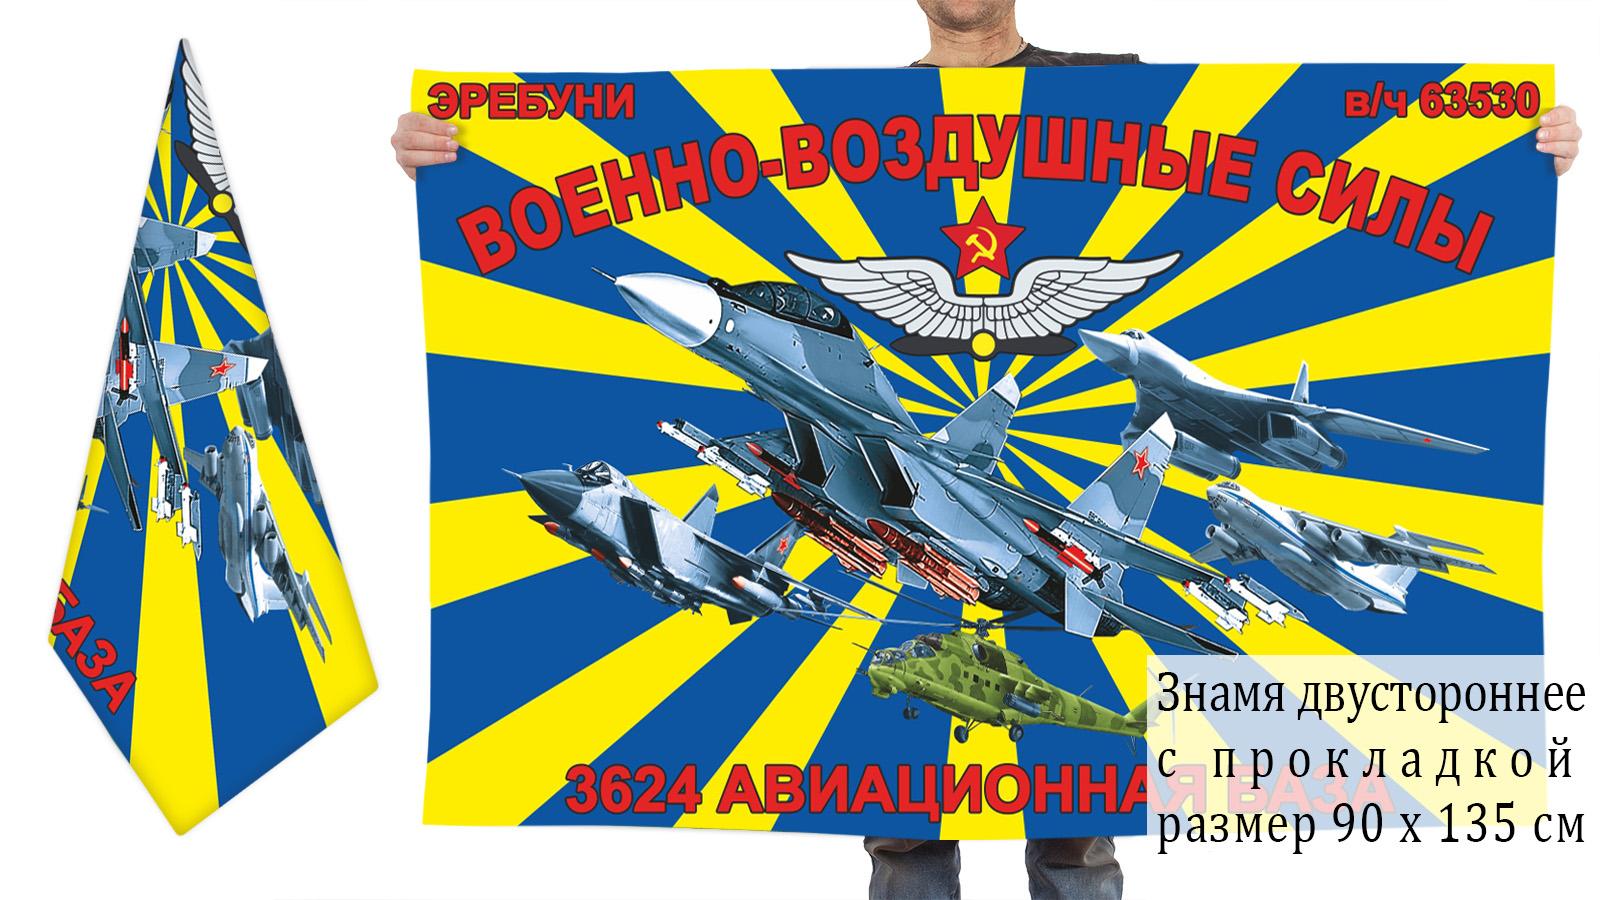 Заказать флаг 3624 Авиационная база